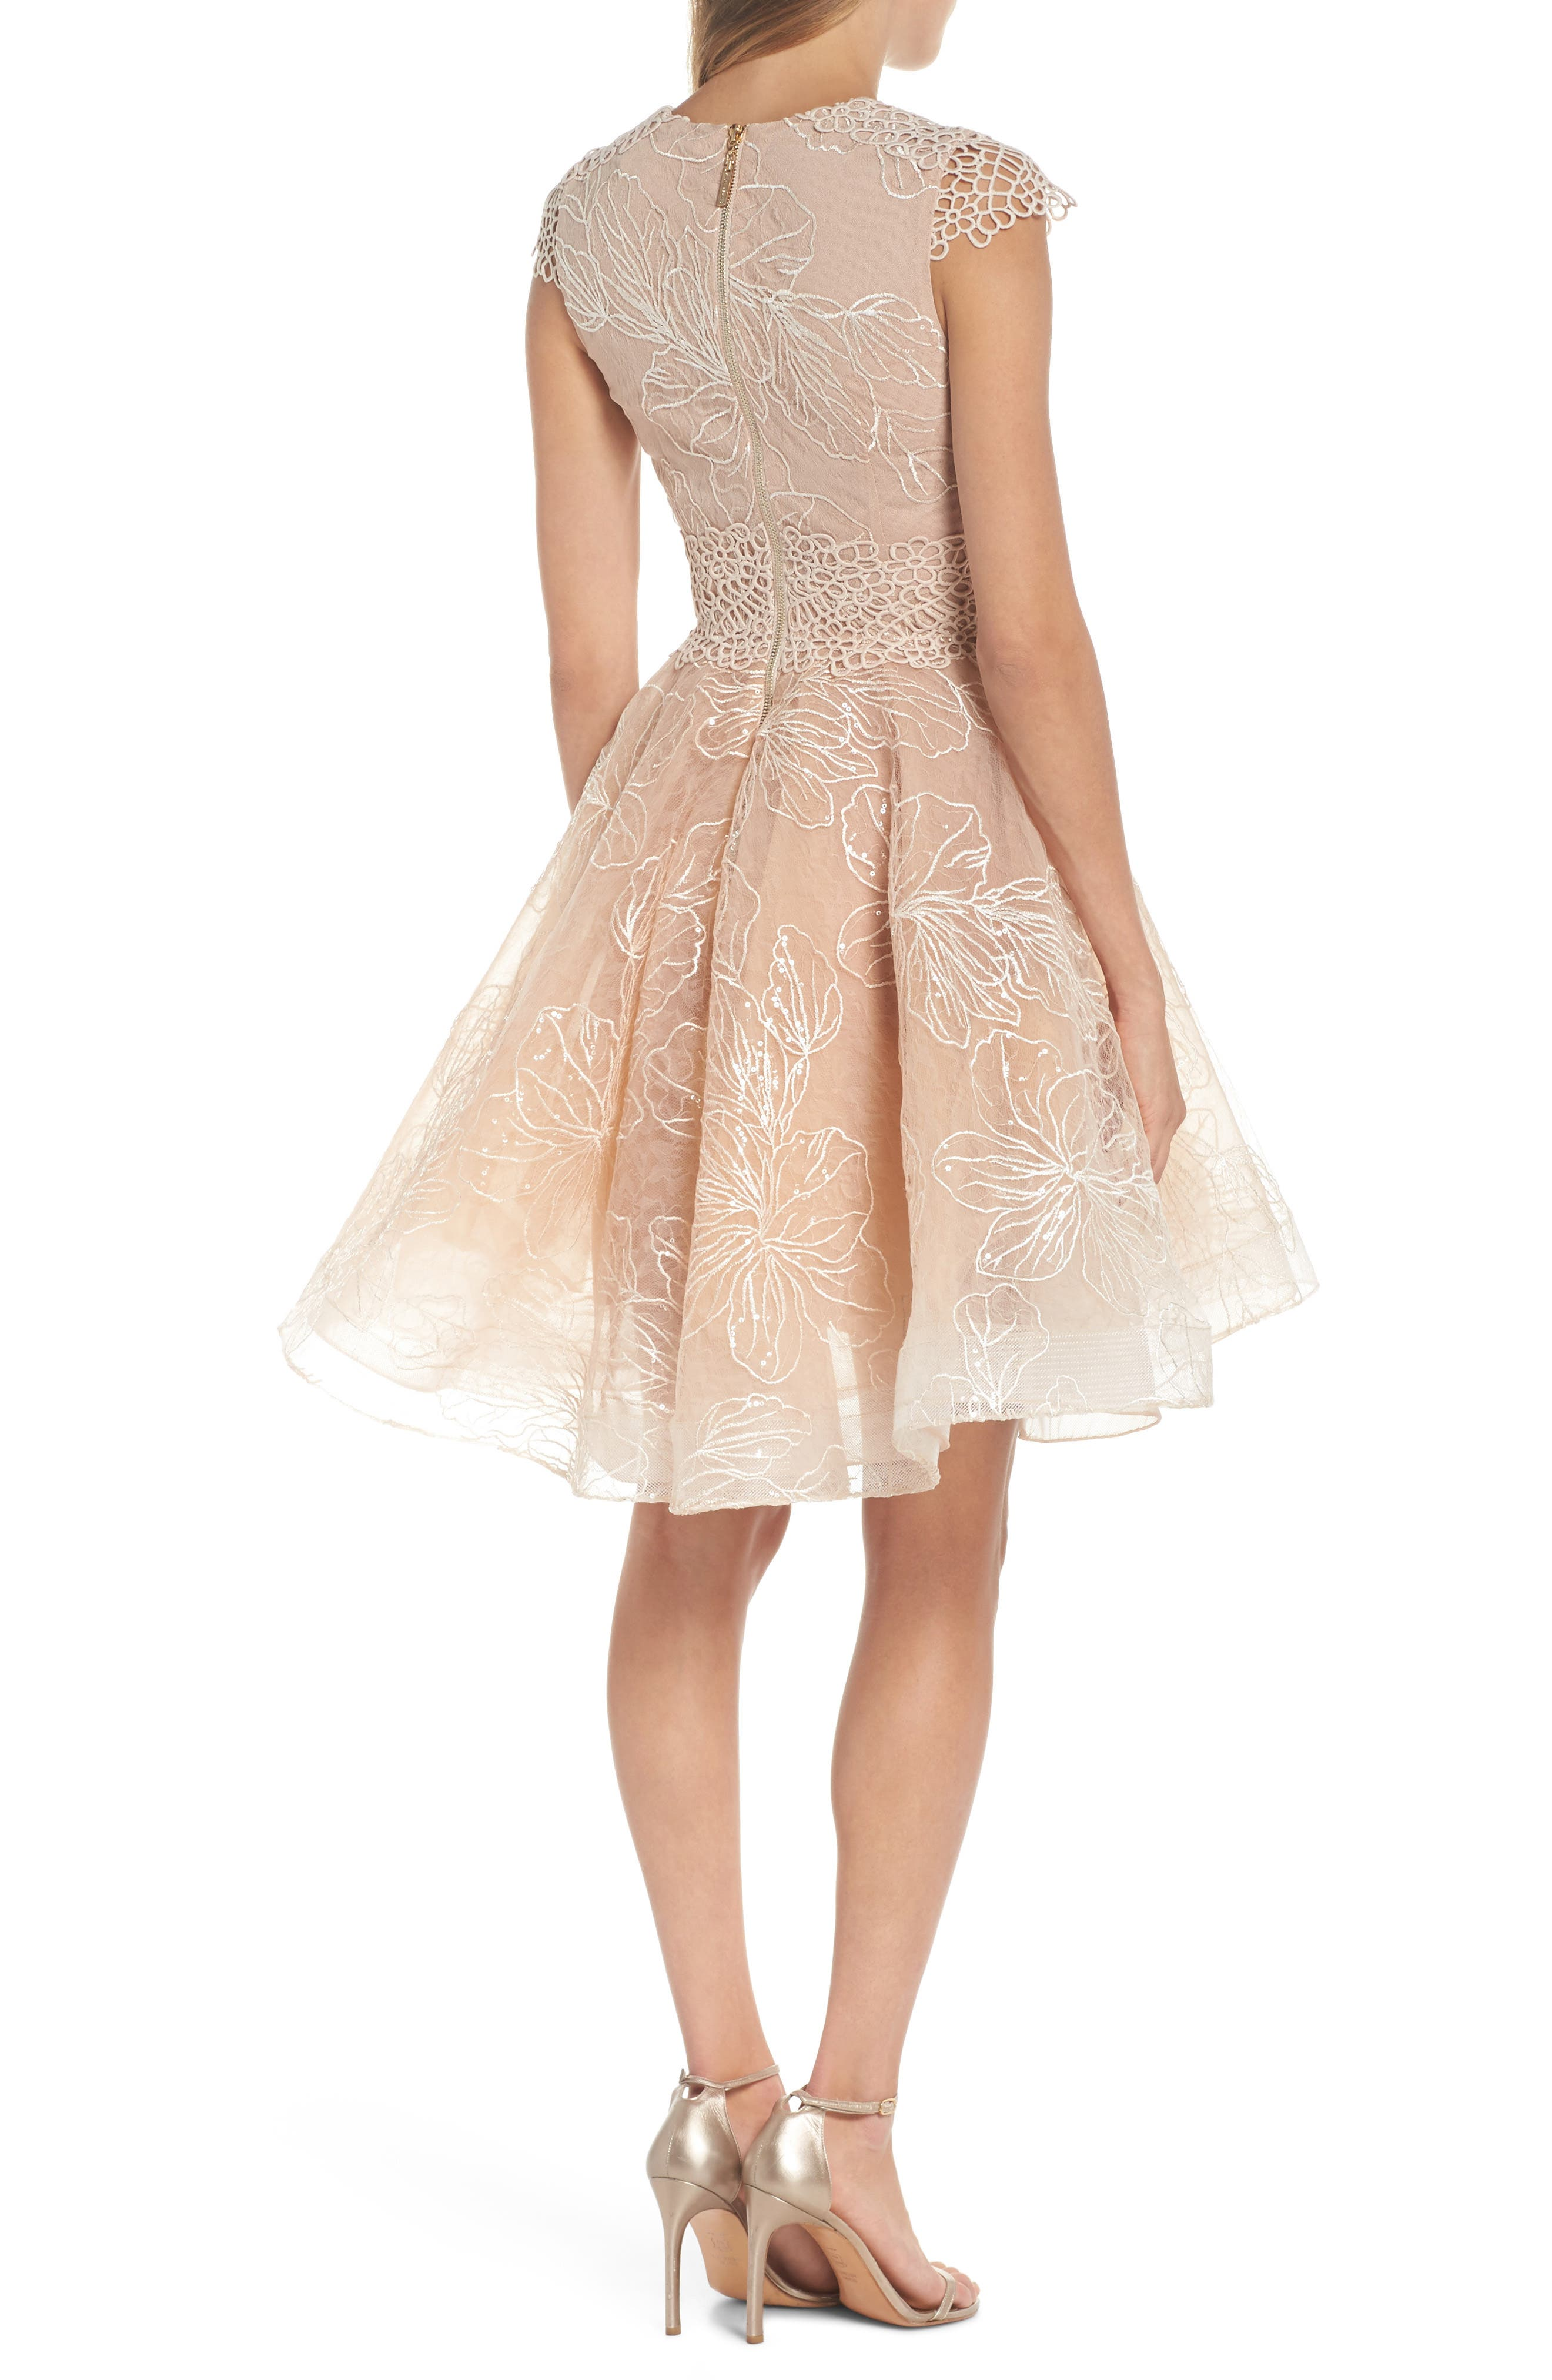 Fiore Sequin Fit & Flare Dress,                             Alternate thumbnail 2, color,                             Beige